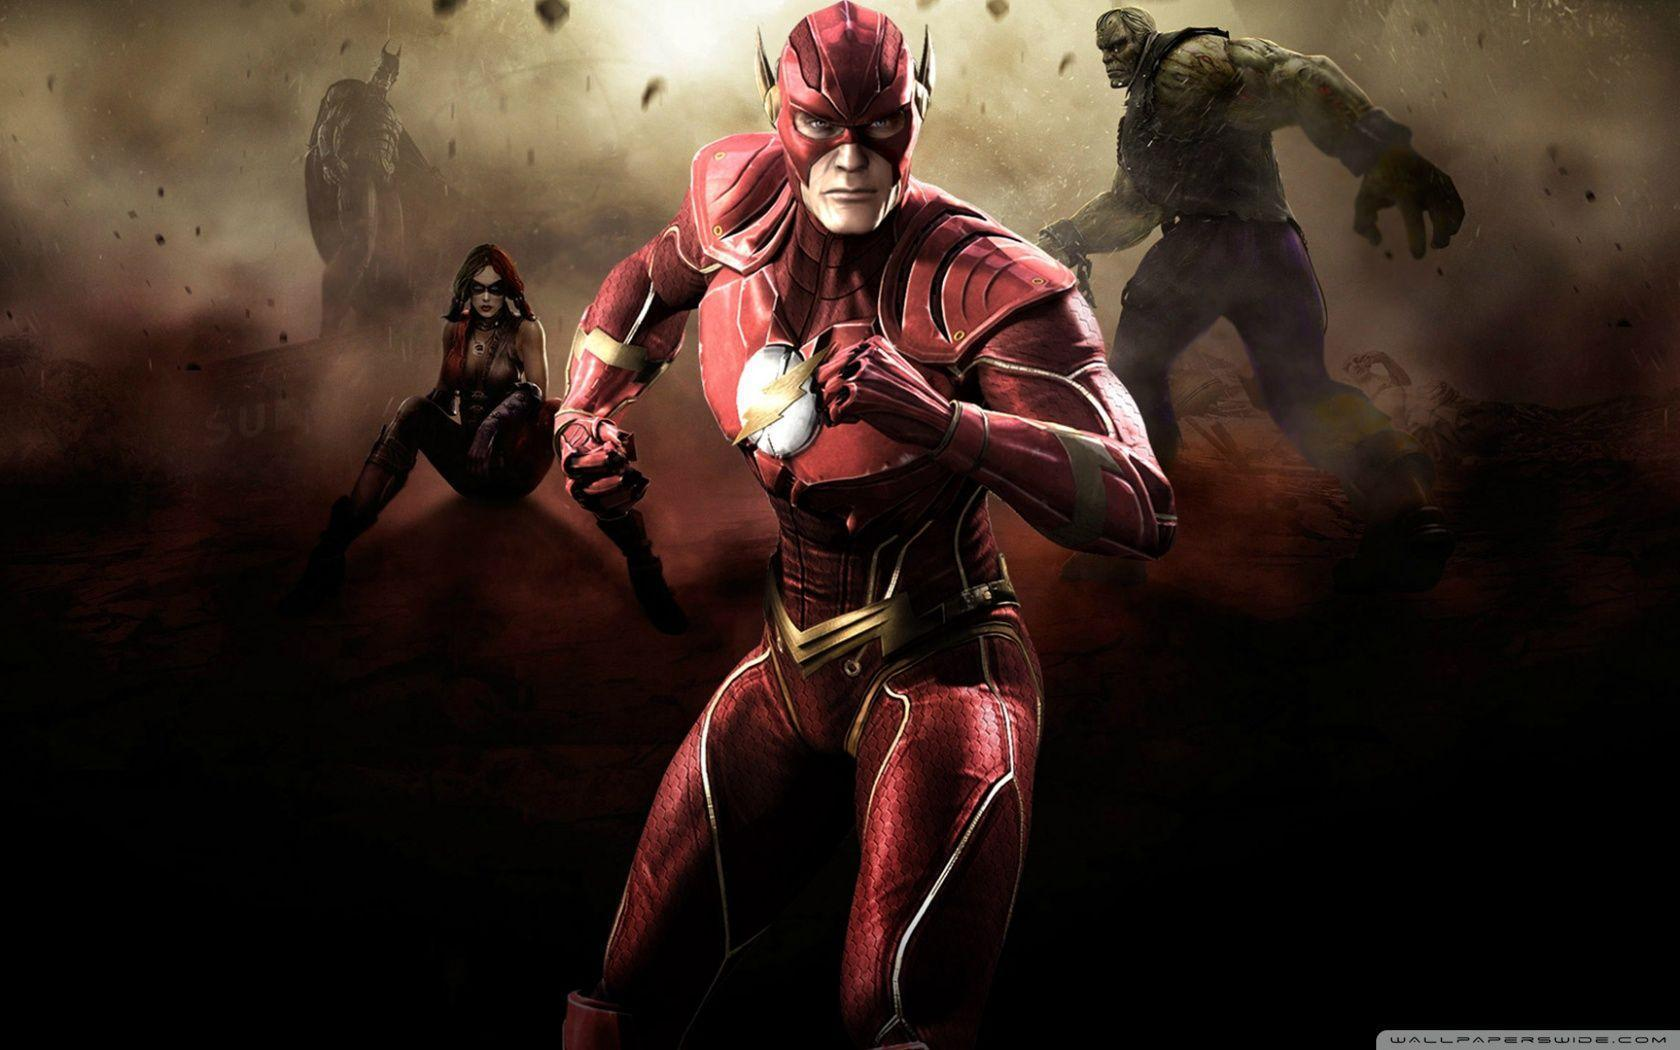 Injustice Gods Among Us - Flash HD desktop wallpaper : Widescreen ...